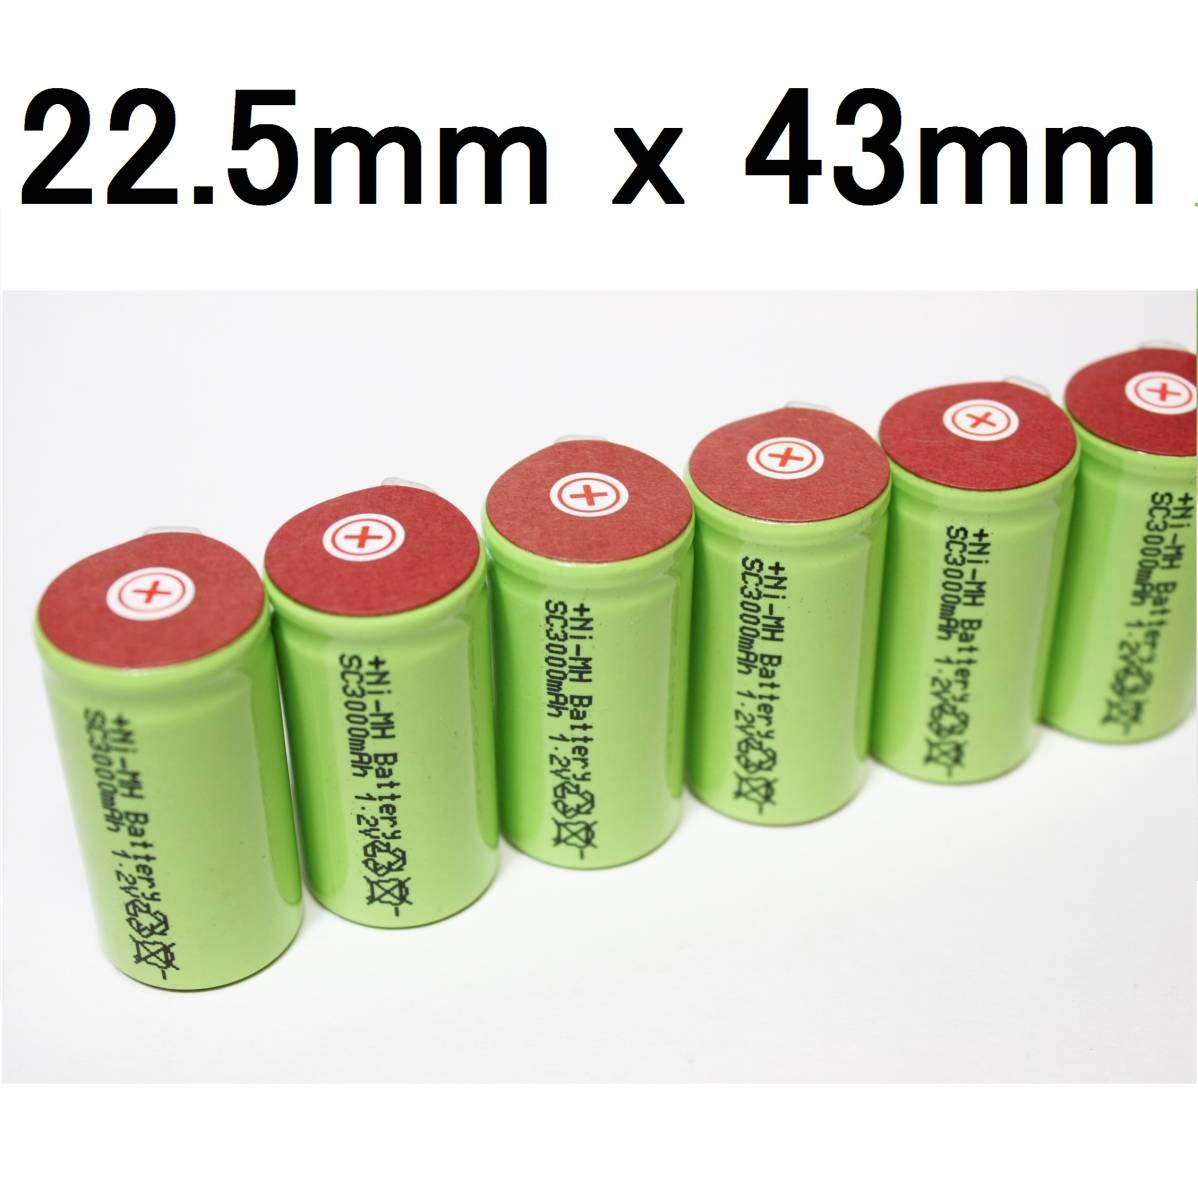 ★22.5x43mm NI-MH Sub-C SC ニッケル水素 ミニ単2 サブC セル エアガン 電動ガン ドライバー ドリル 工具 掃除機 充電池 バッテリー03_画像1